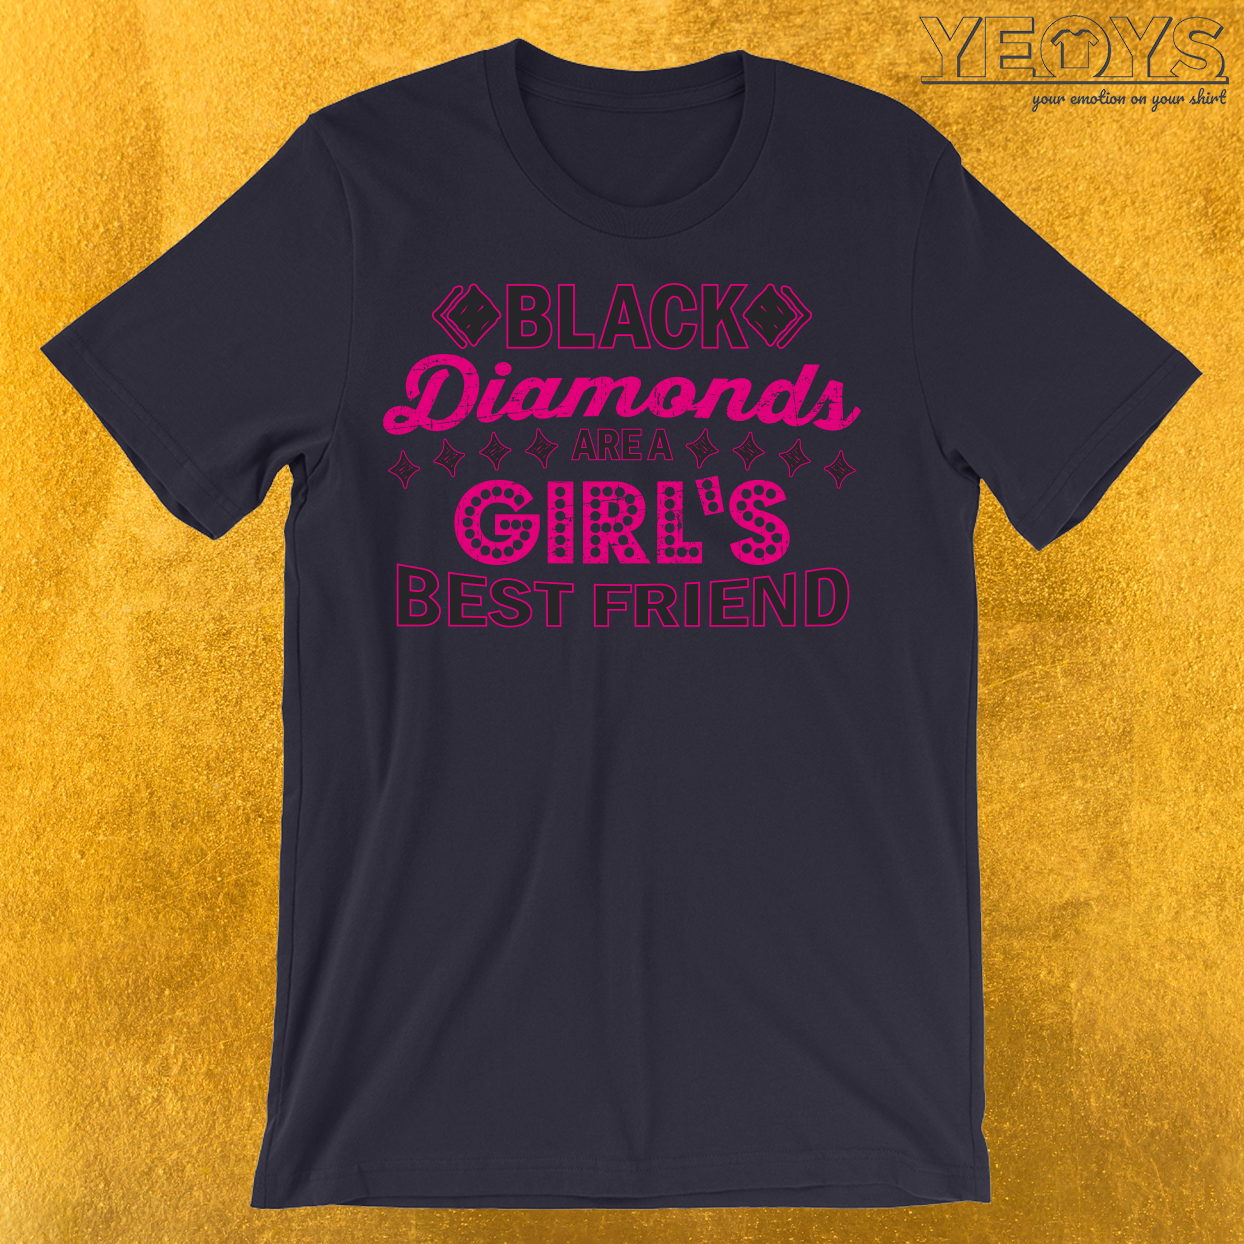 Black Diamonds Girl's Best Friend T-Shirt